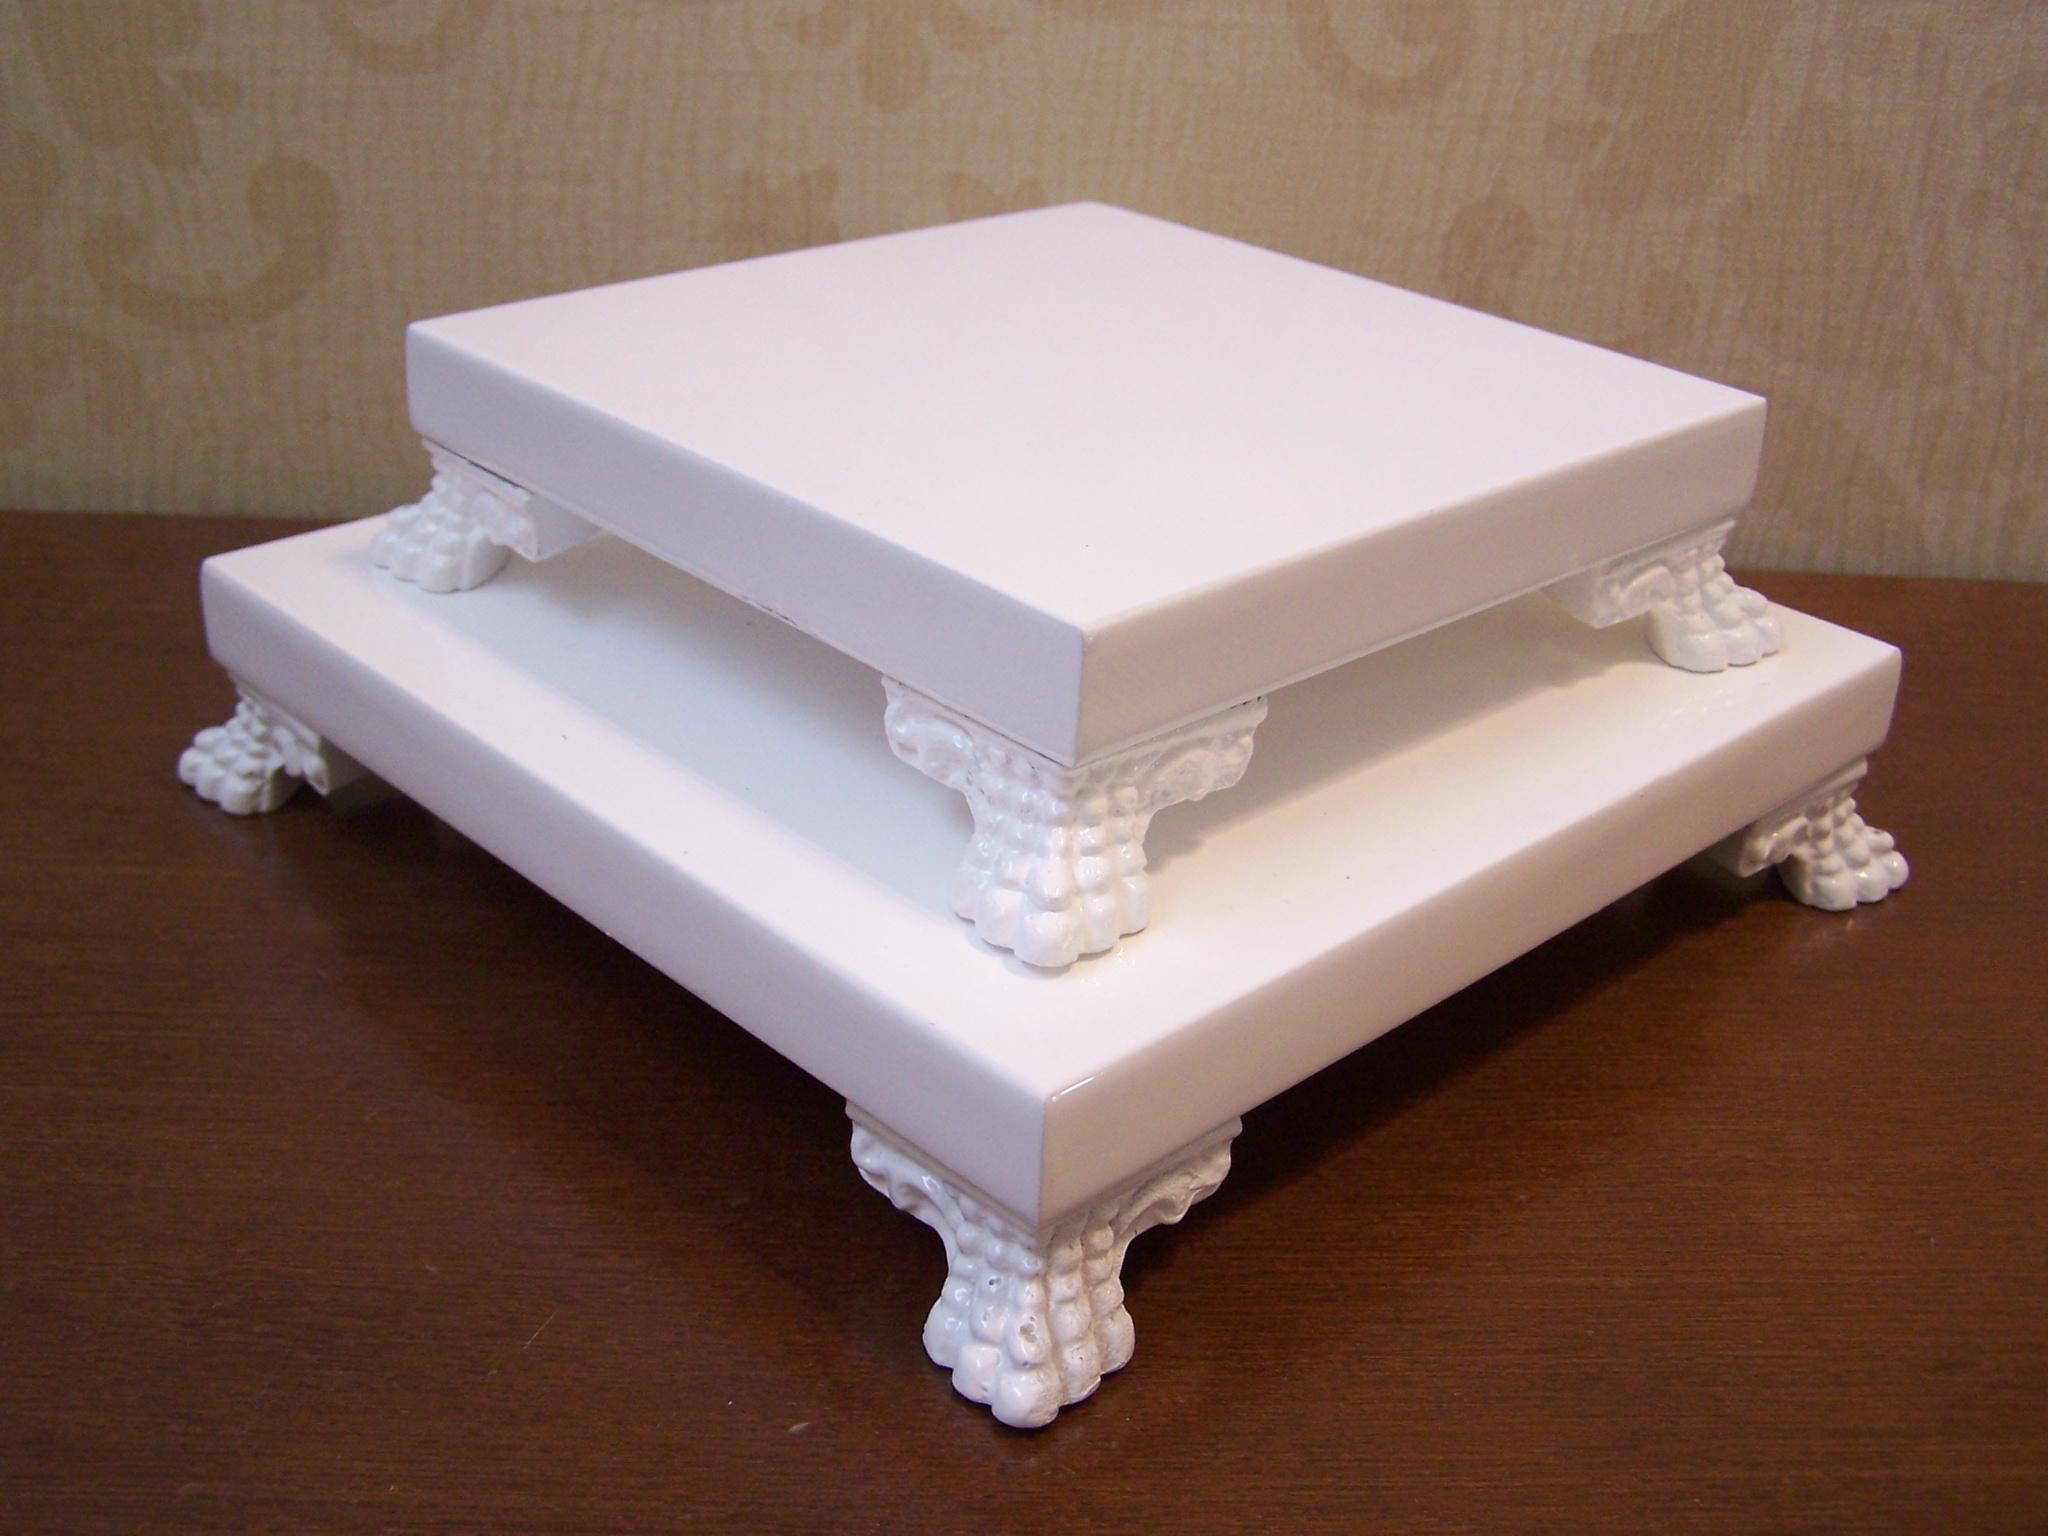 suporte para doces duas pecas base para decoracao mesa festa #5A311D 2048x1536